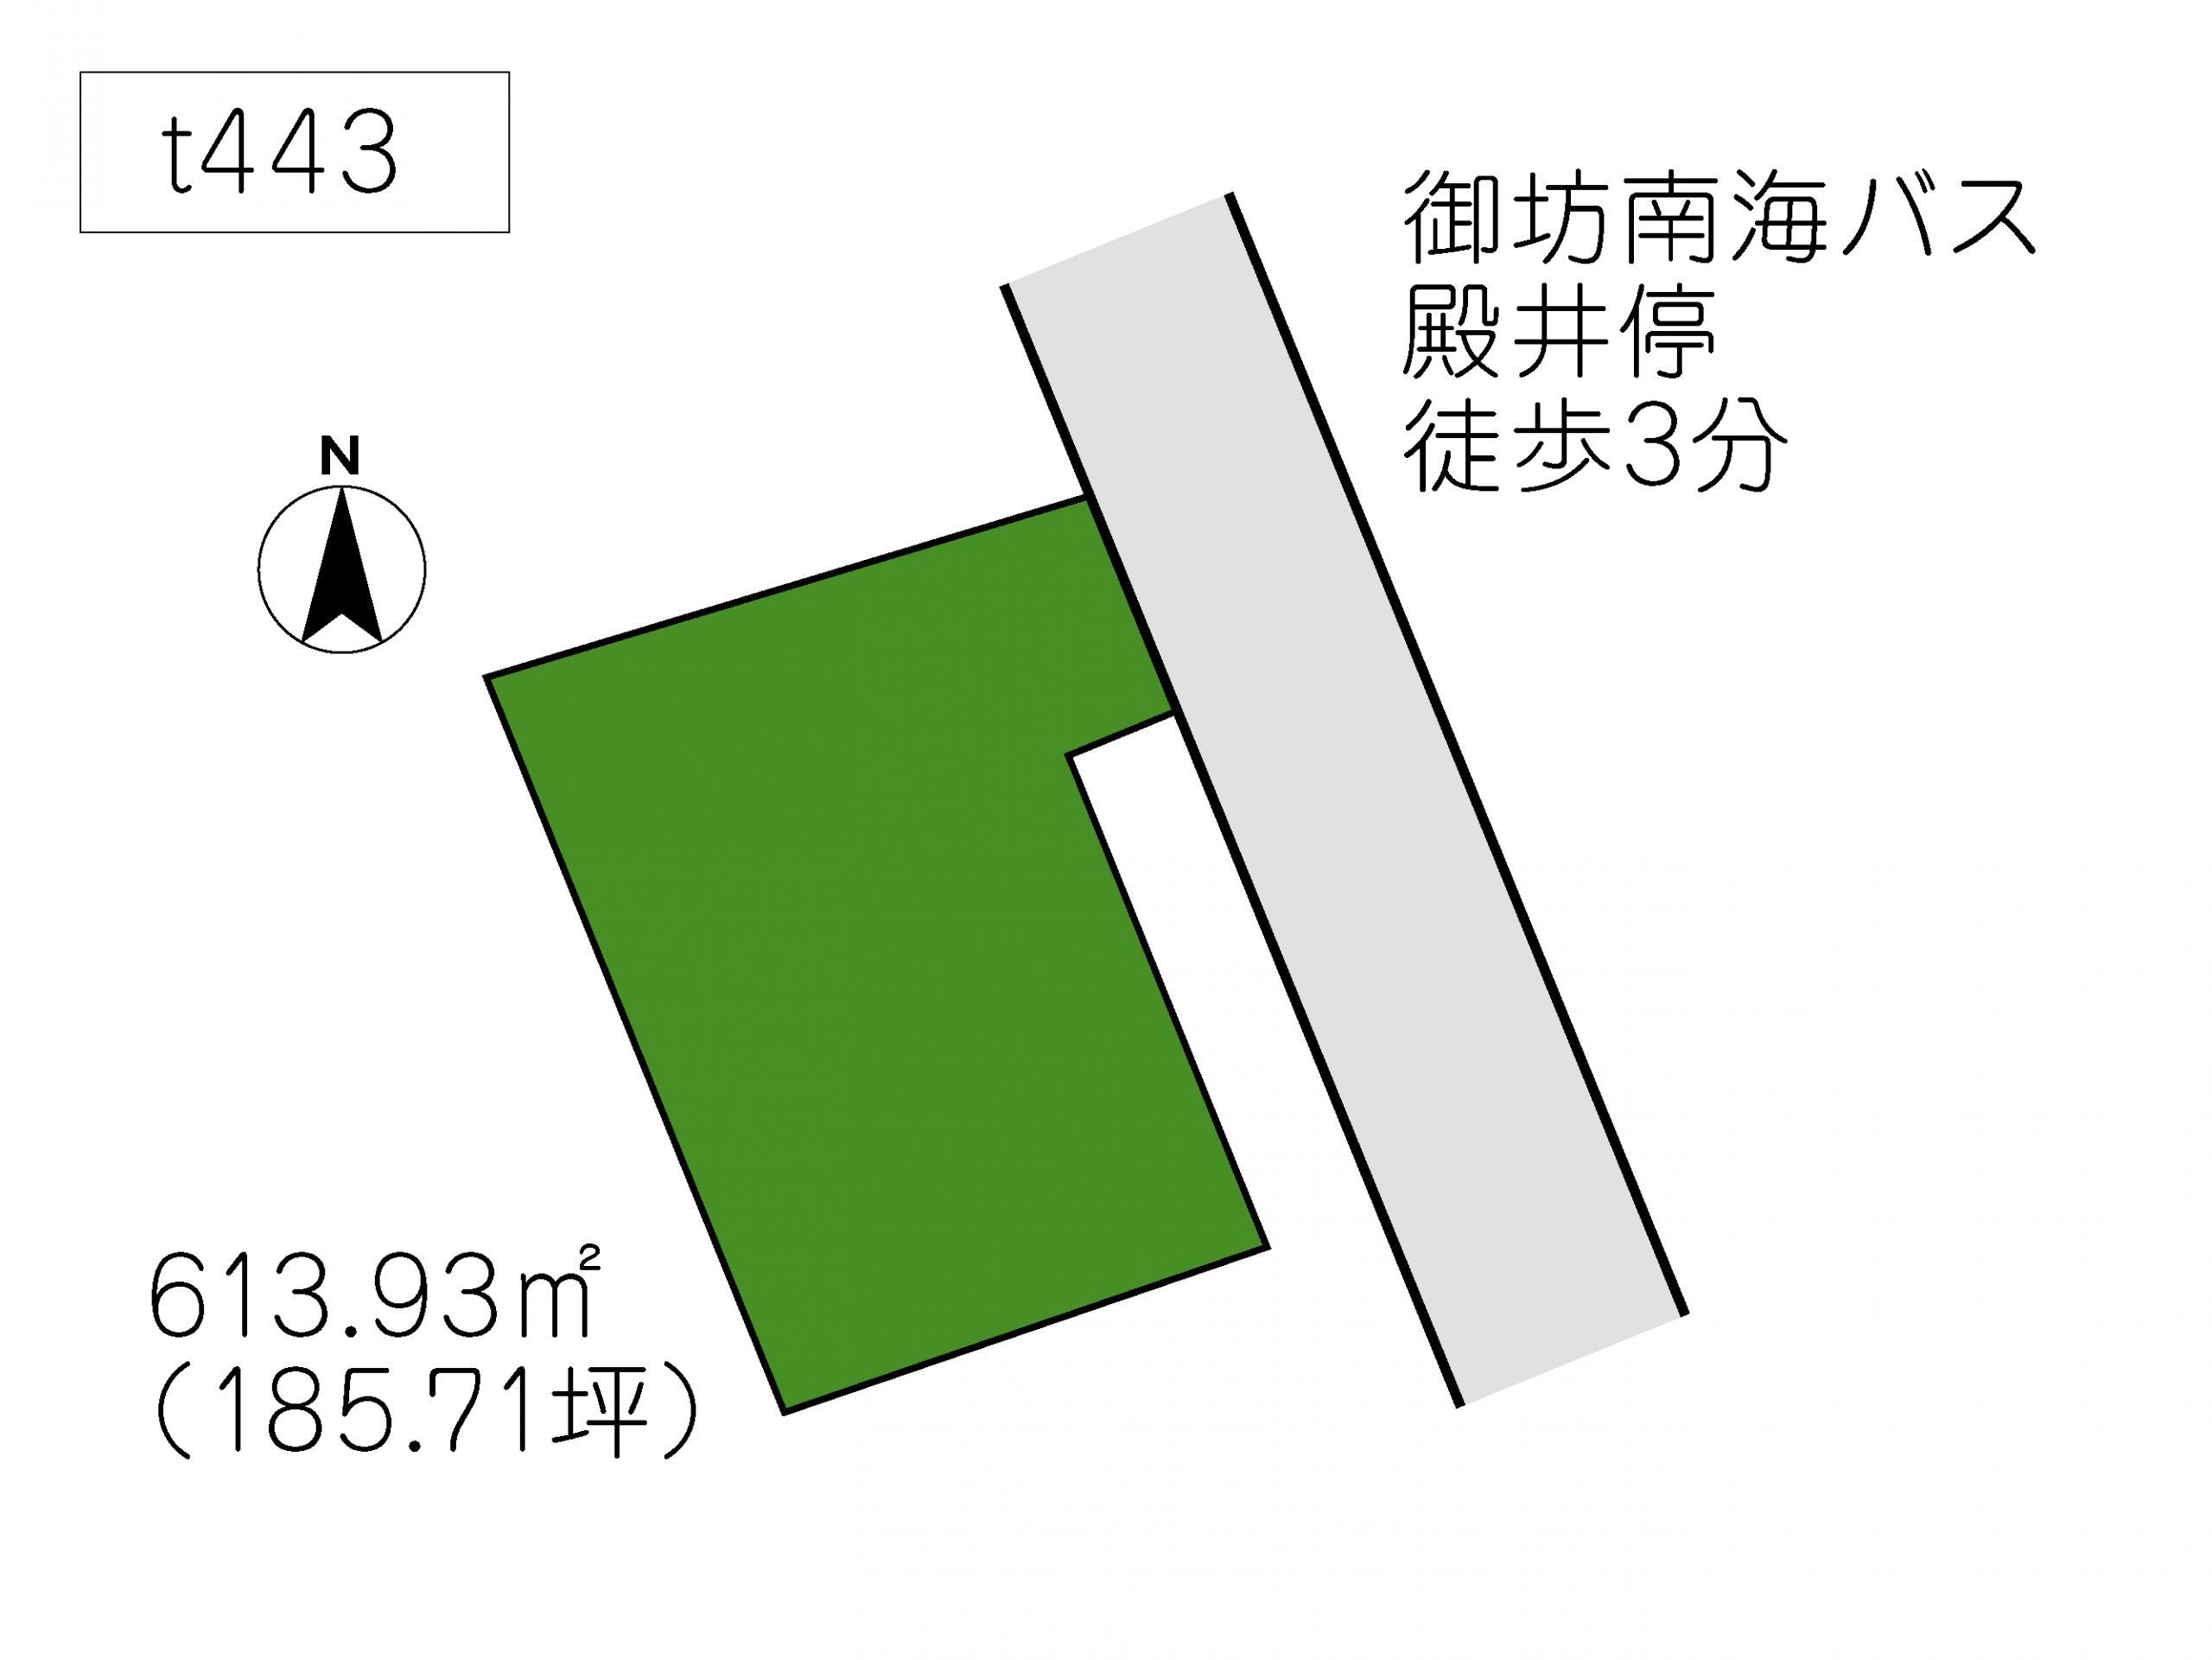 T443 広川町殿